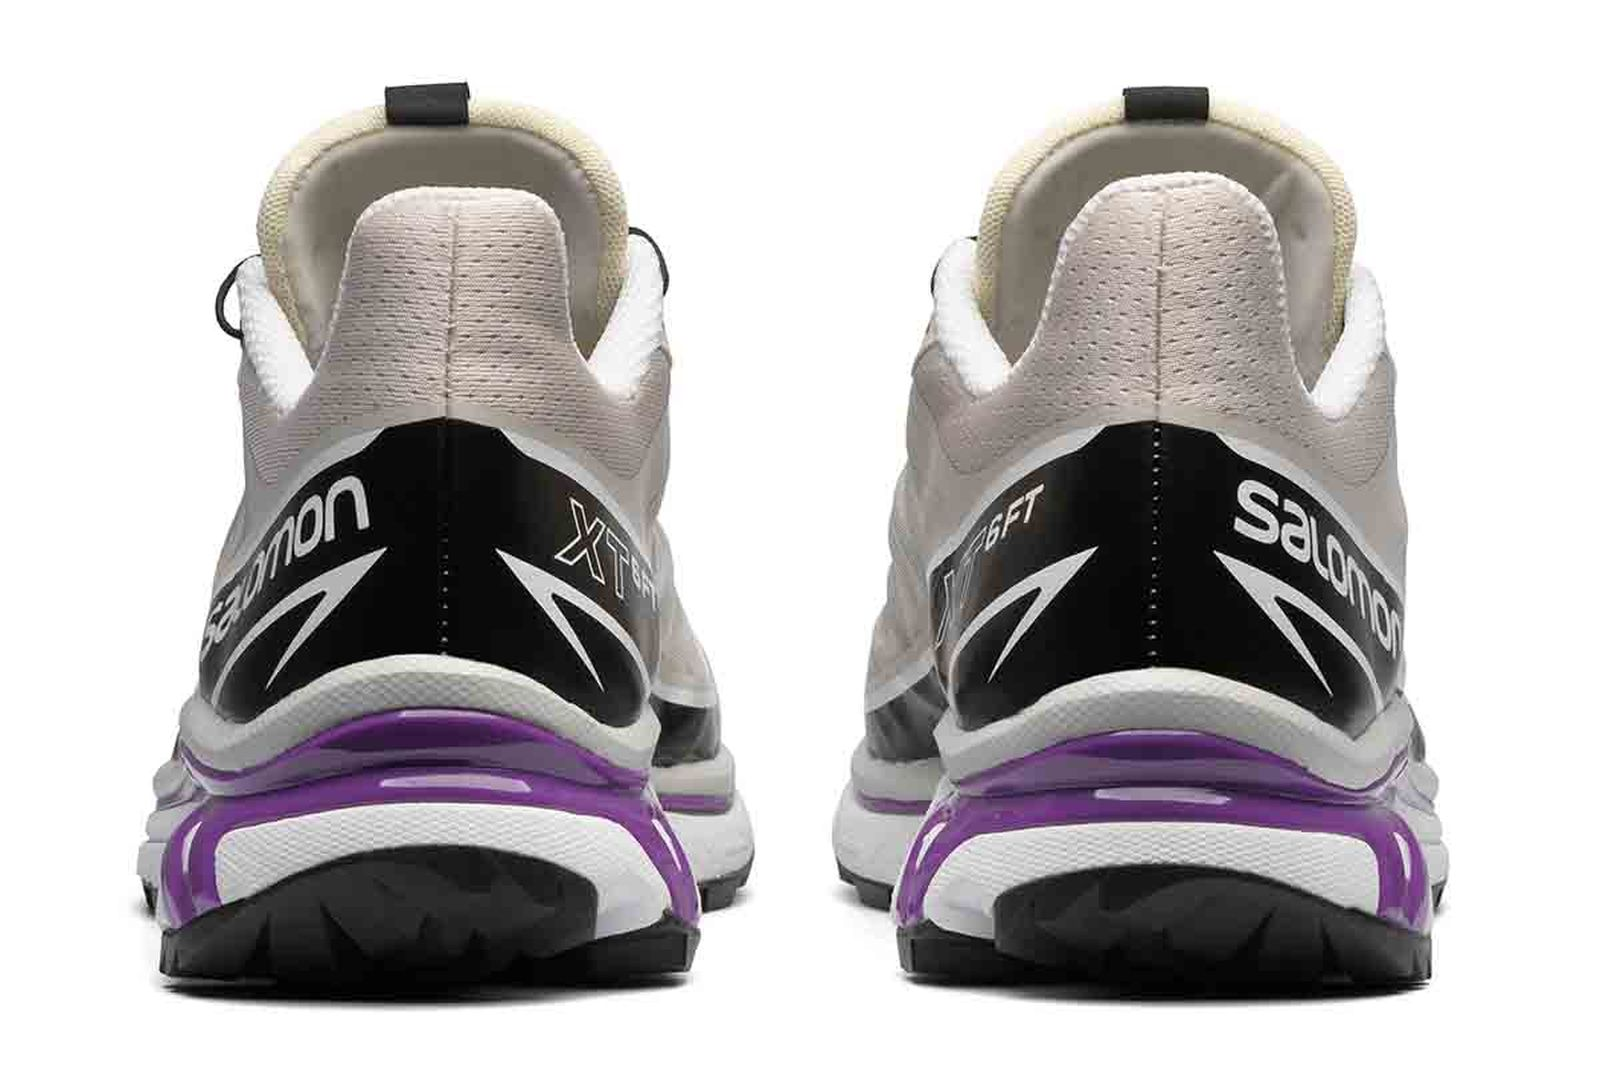 salomon-xt-6-ft-release-date-price-07